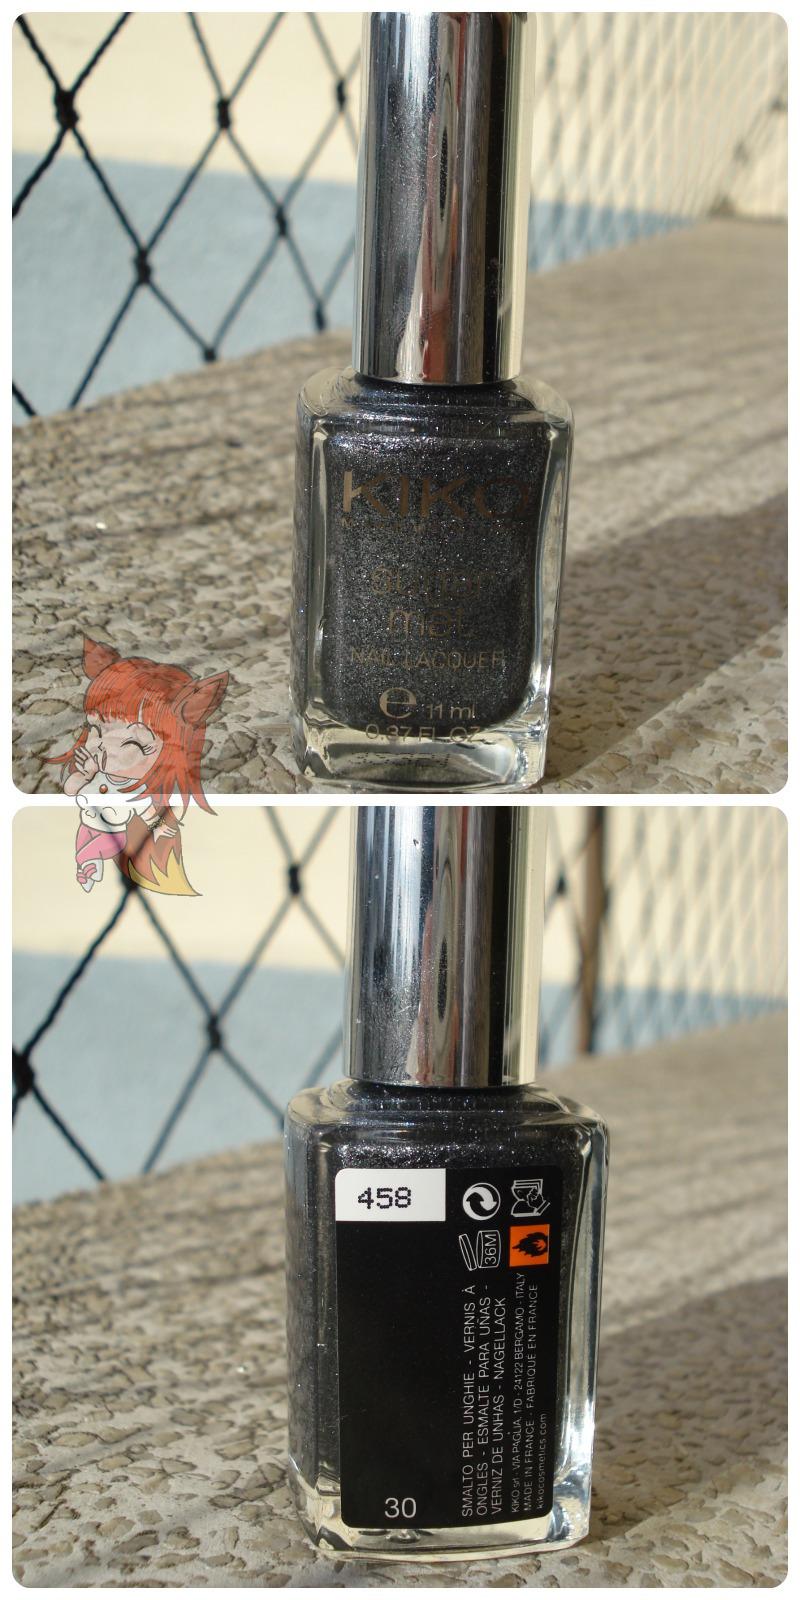 Esmalte Kiko 458 Anthracite Sugar Mat - Resenha